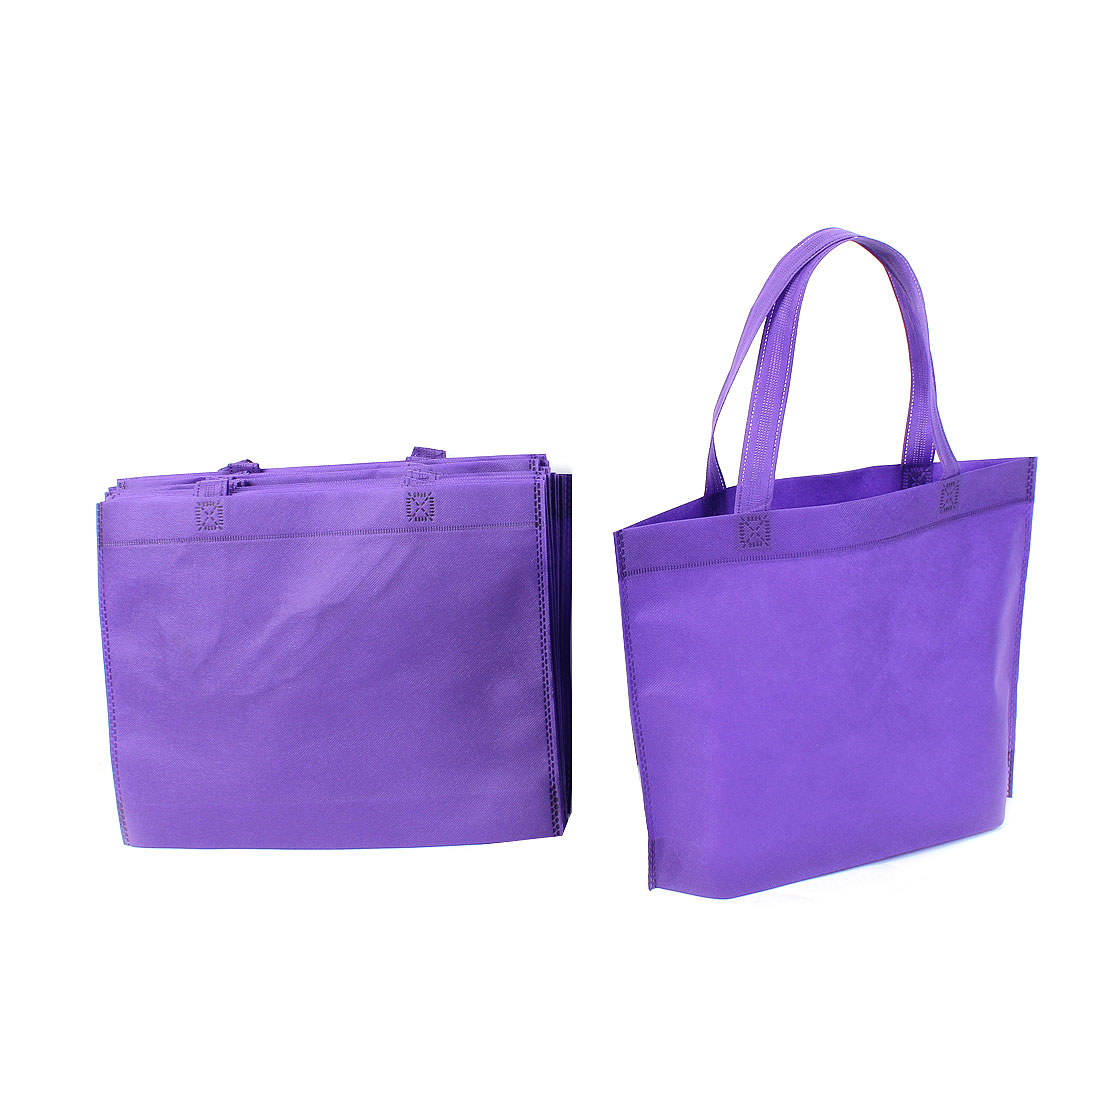 Home Non Woven Foldable Storage Shopping Bag 35cm x 28cm Purple 20 Pcs